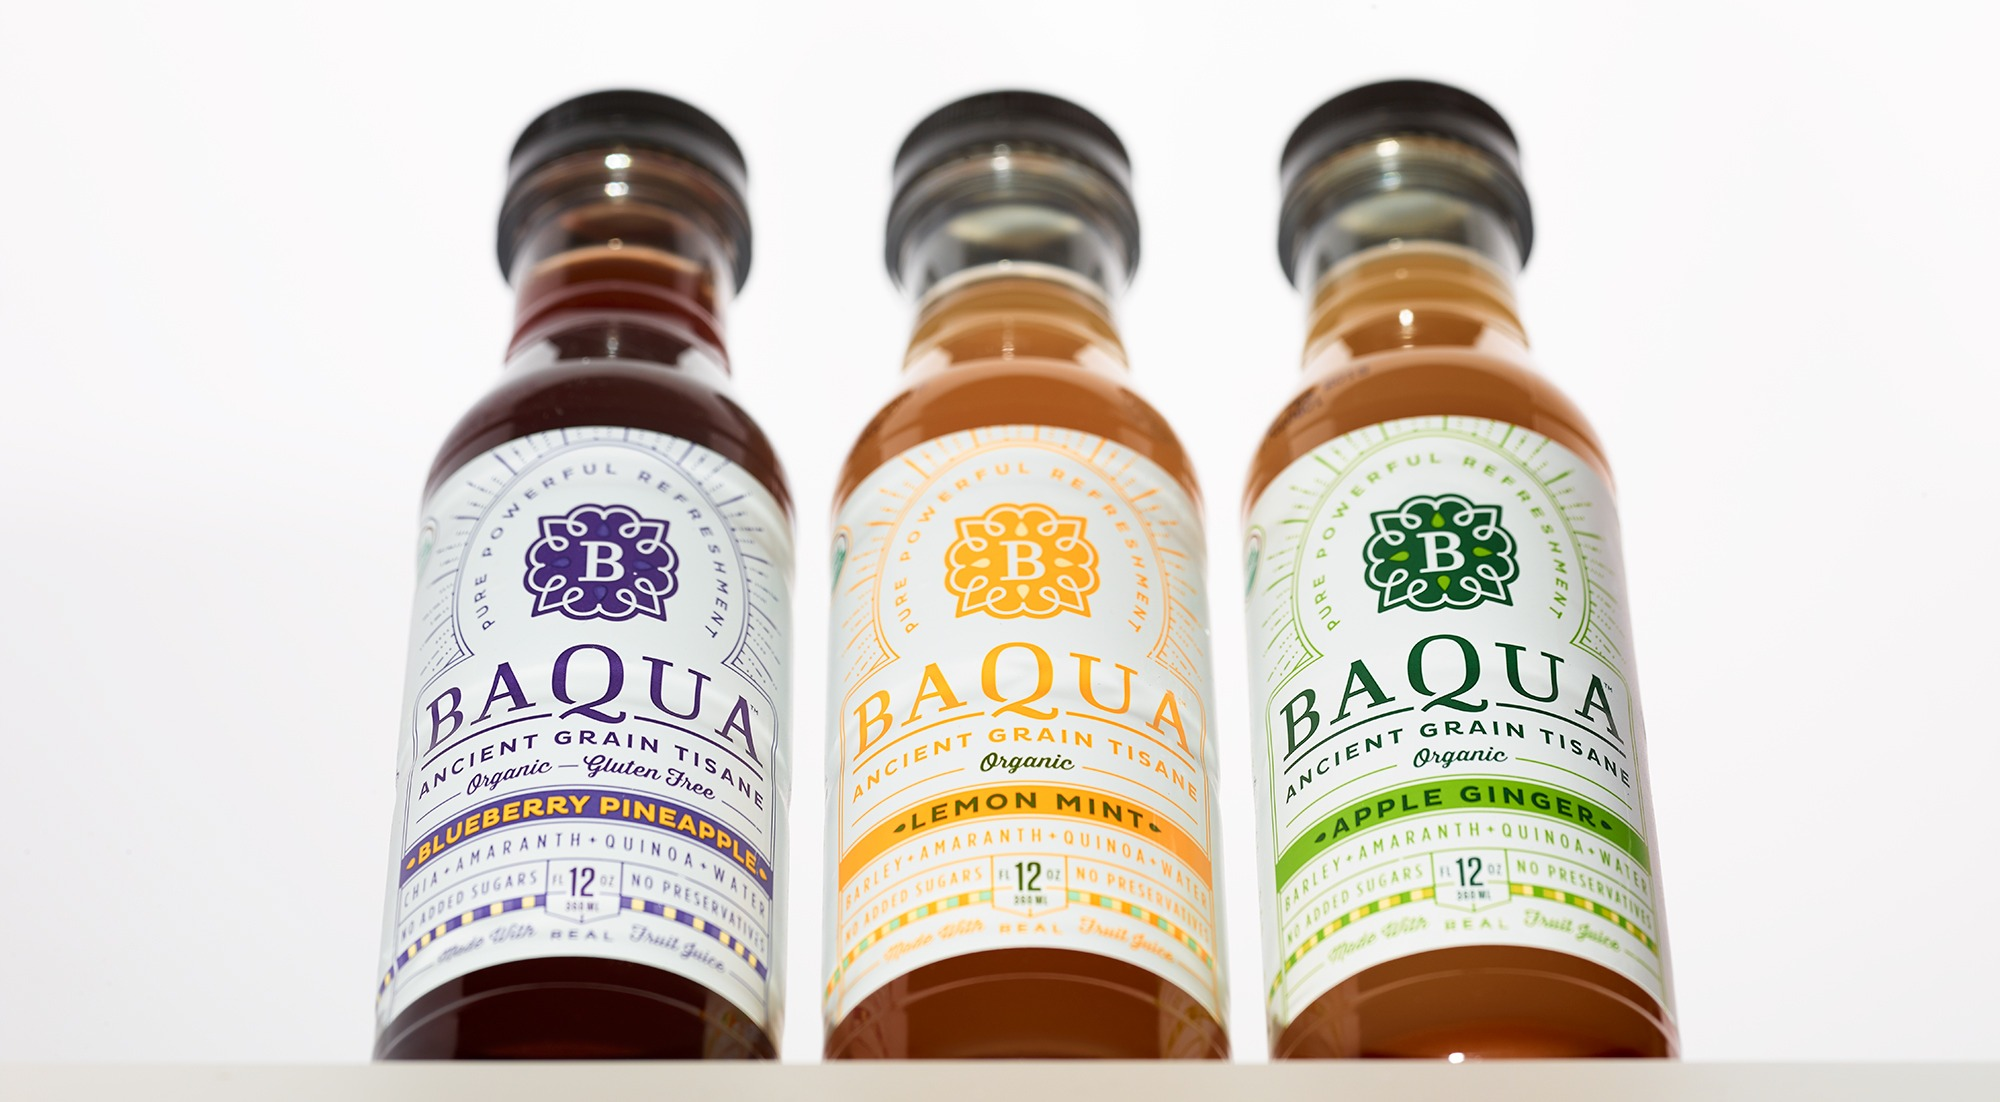 Baqua bottle packaging